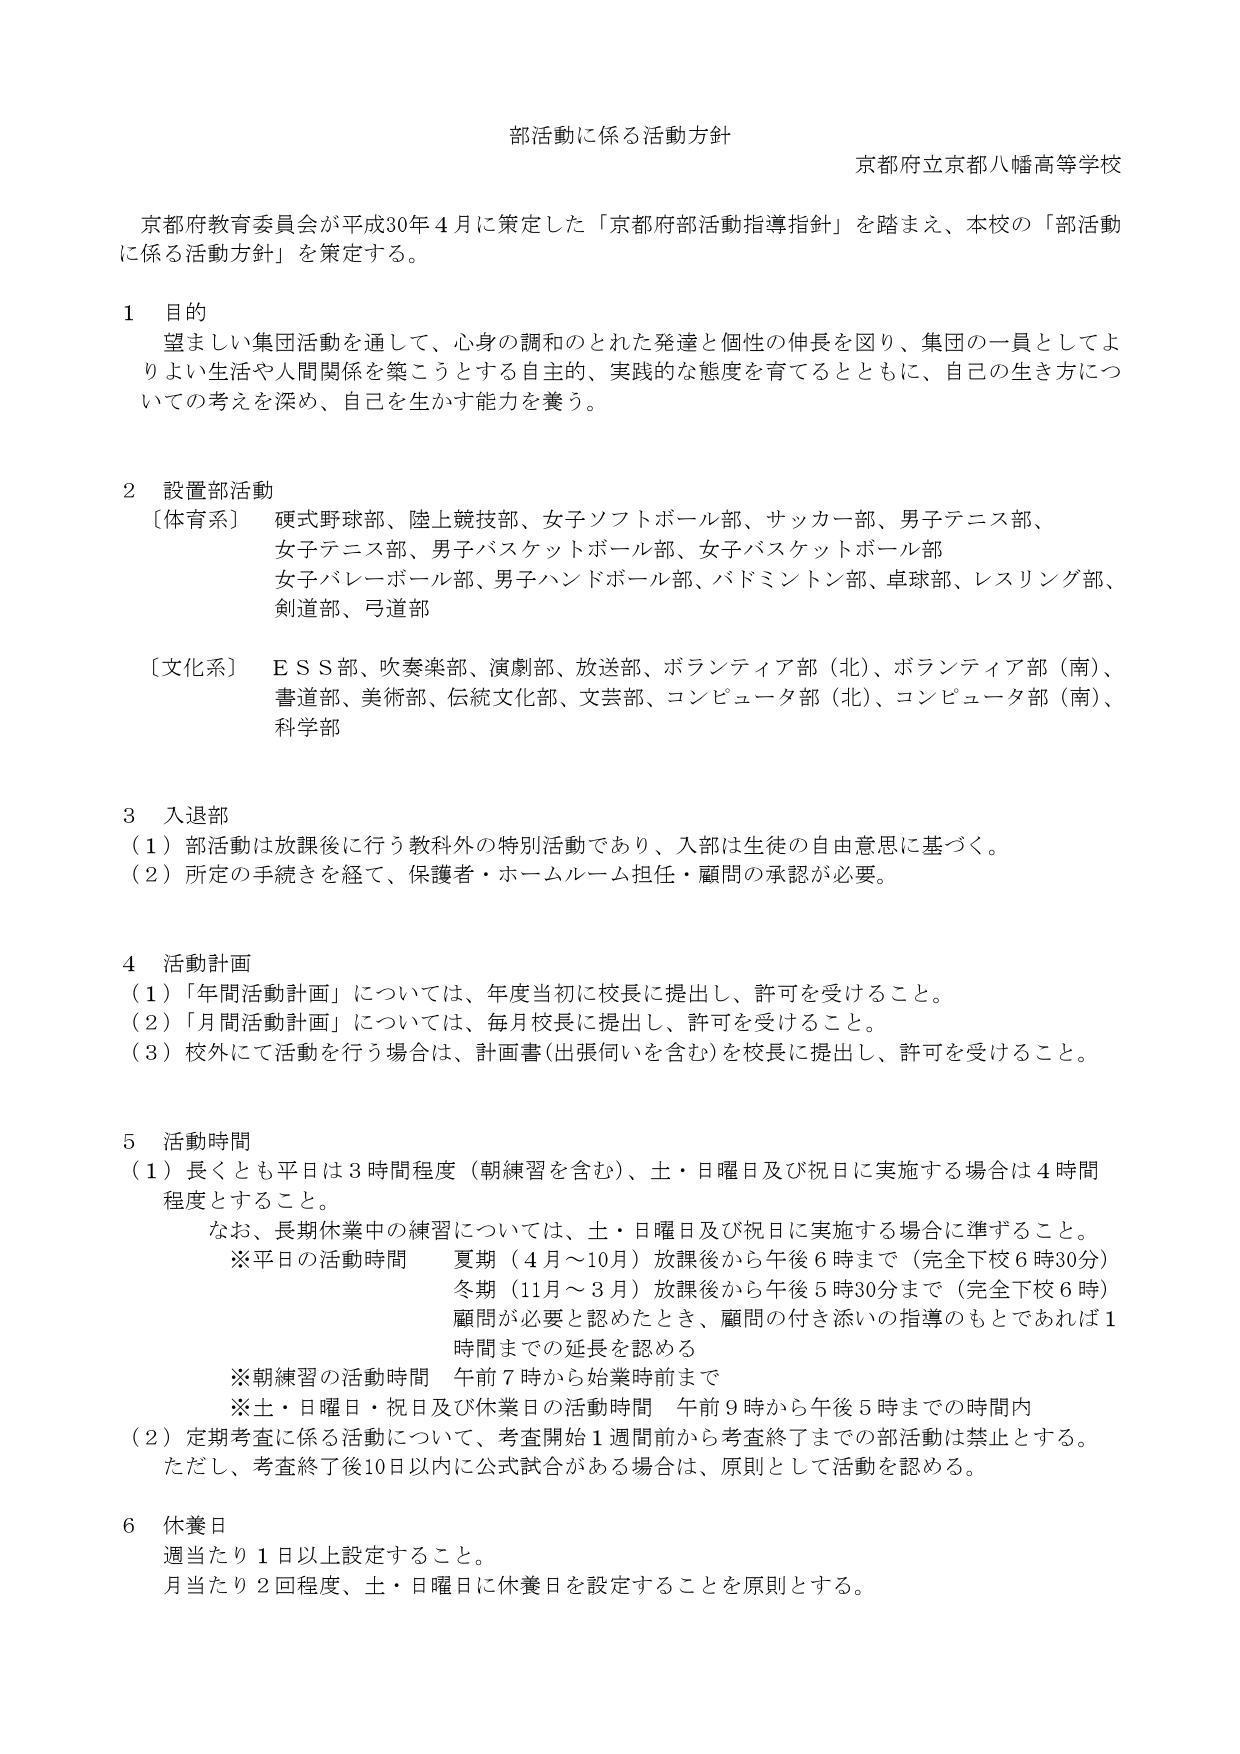 http://www.kyoto-be.ne.jp/kyotoyawata-hs/mt/club/images/210514_katudouhousin_1.jpg